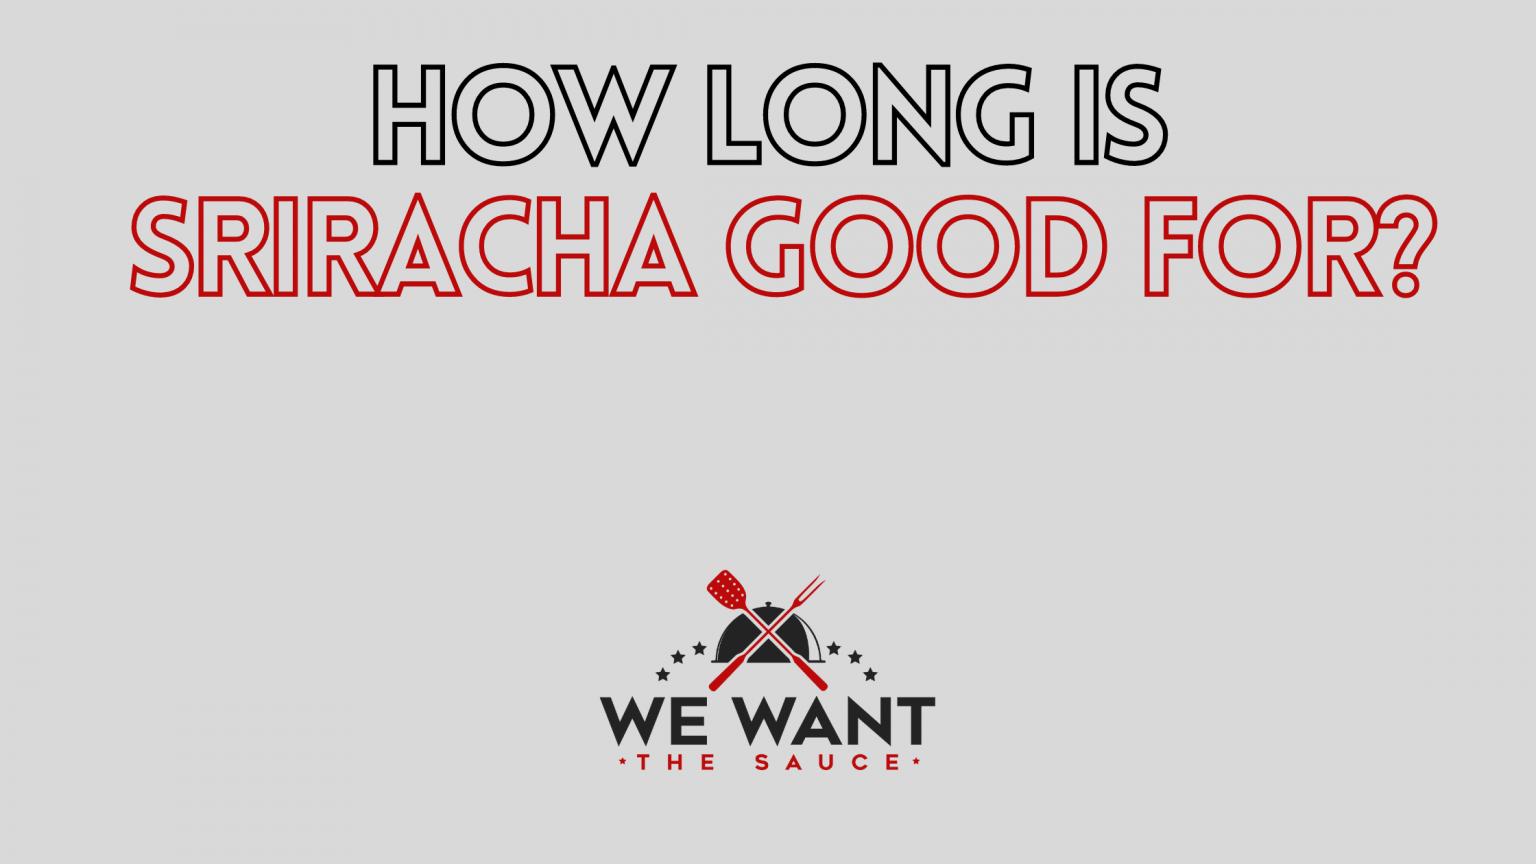 How Long Is Sriracha Good For?